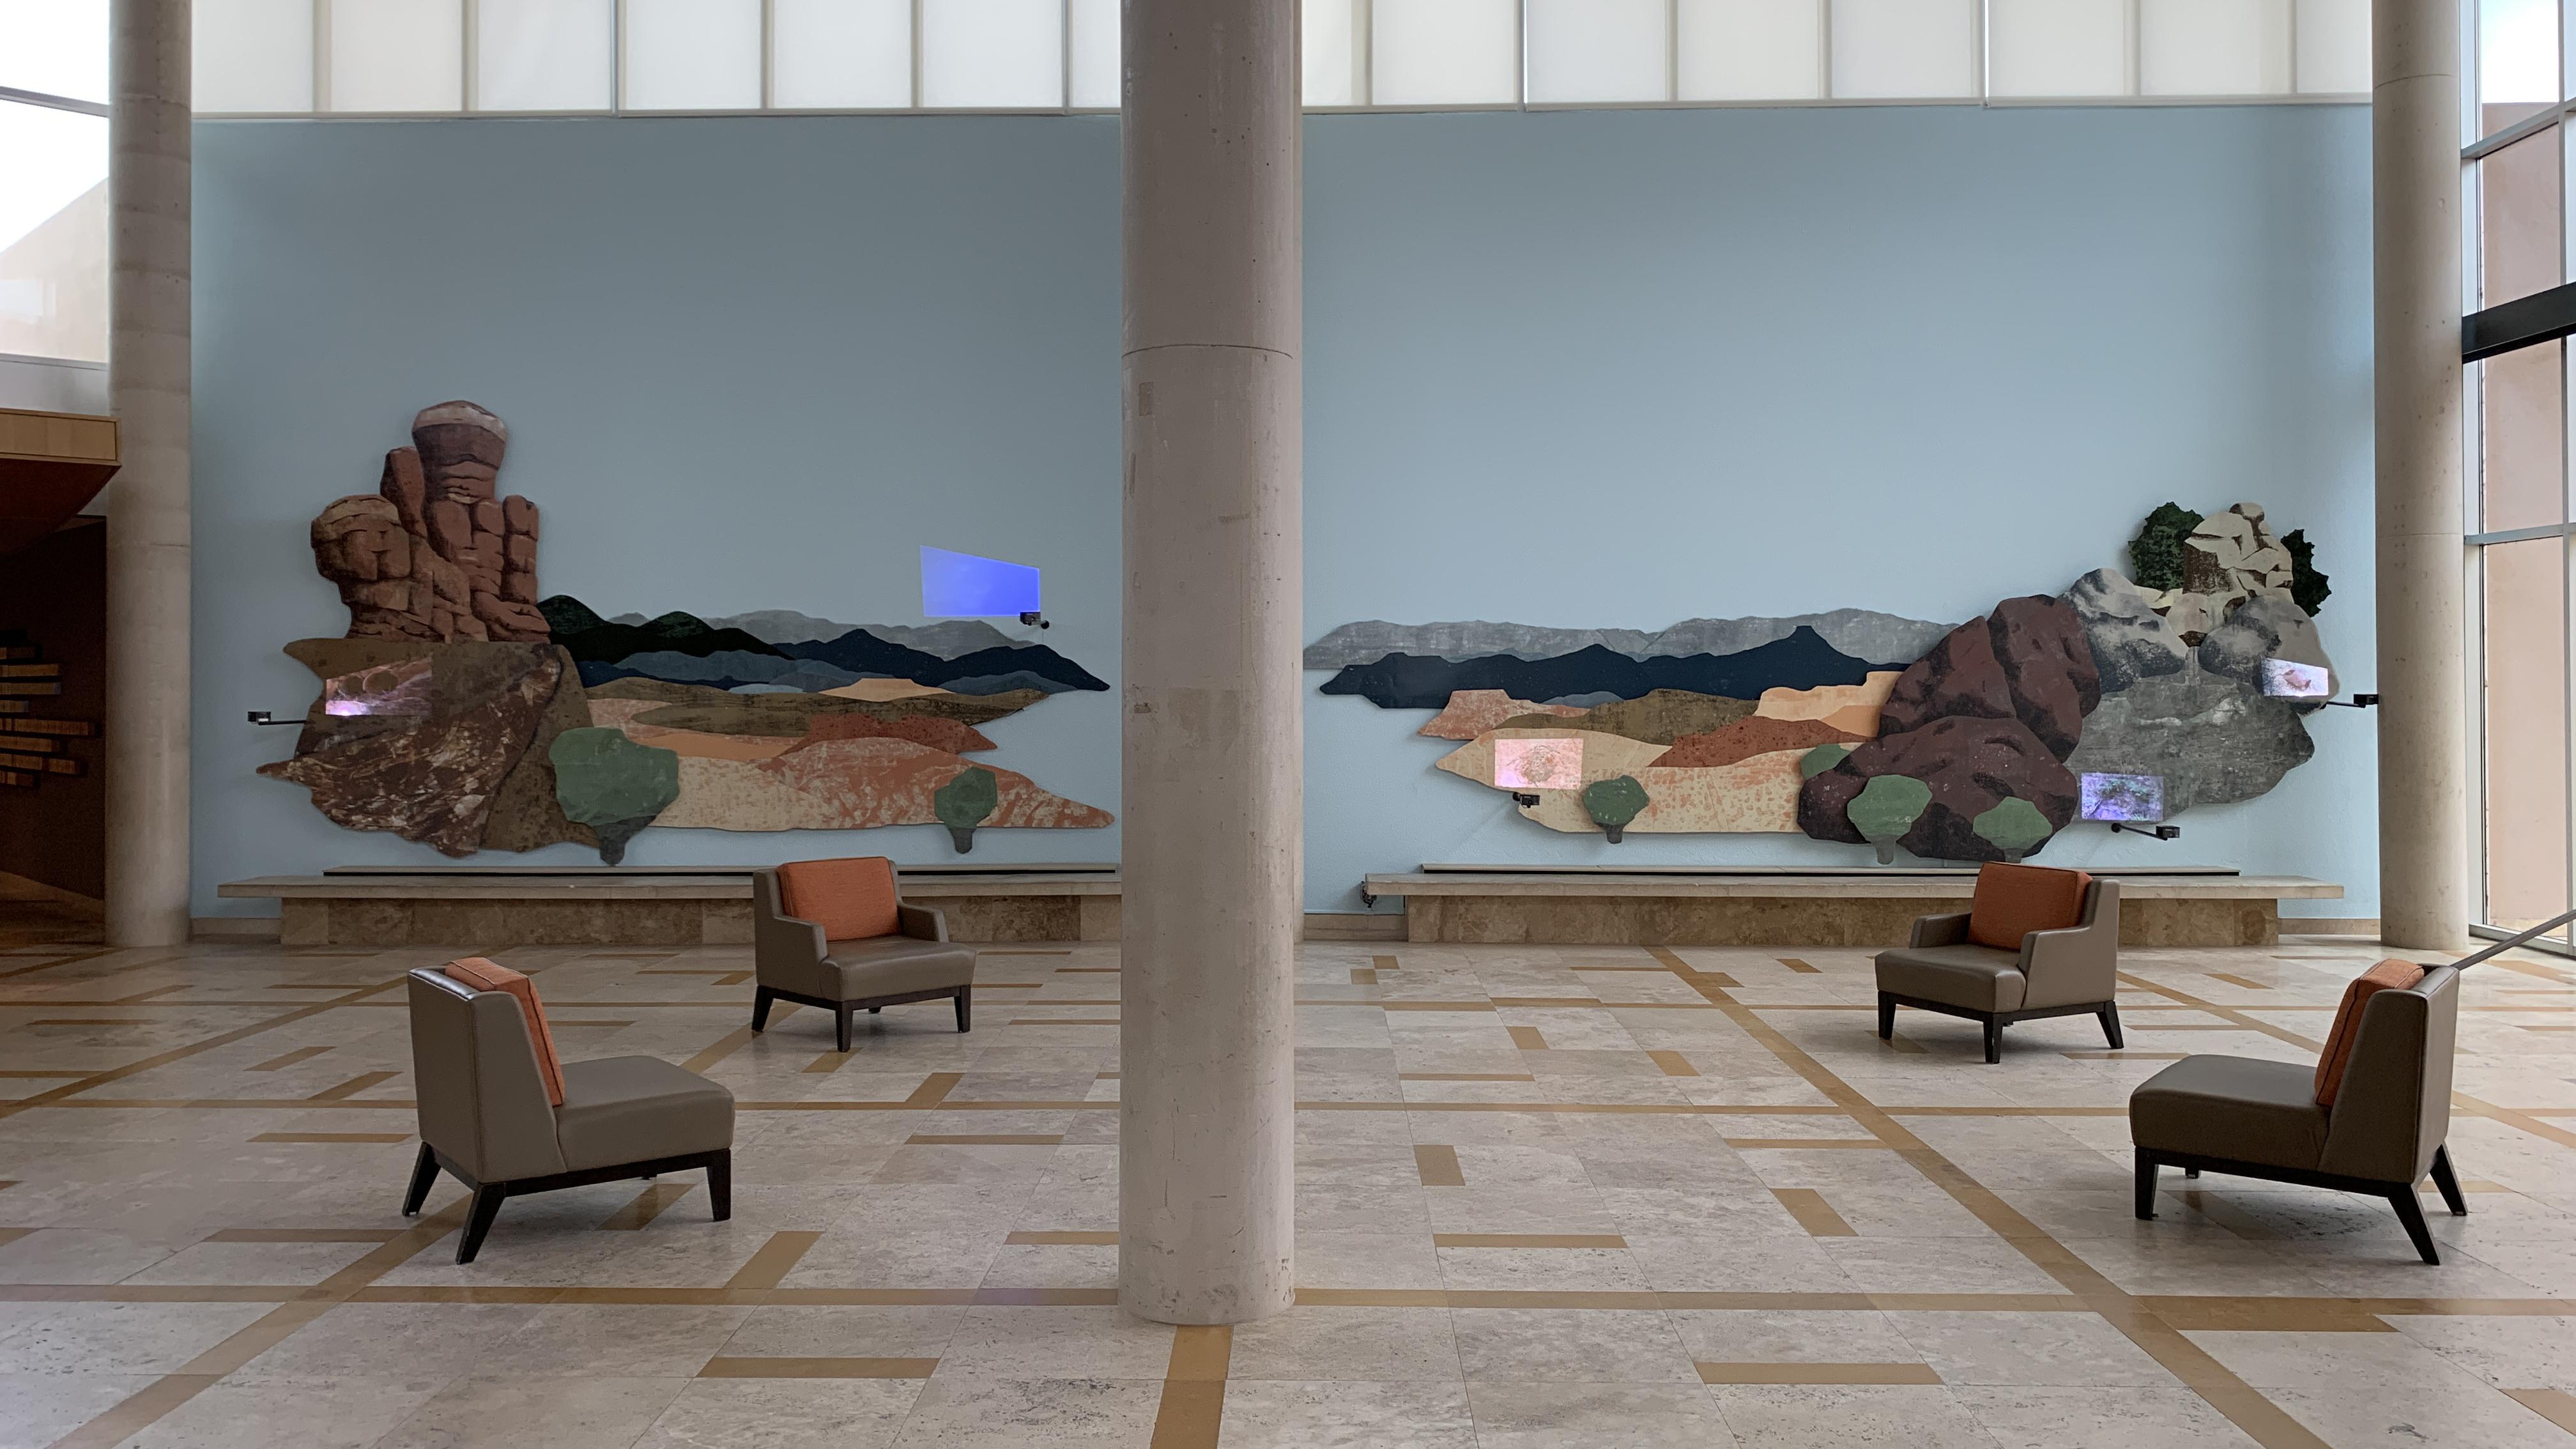 Nicola Lopez, Haunted, installation view